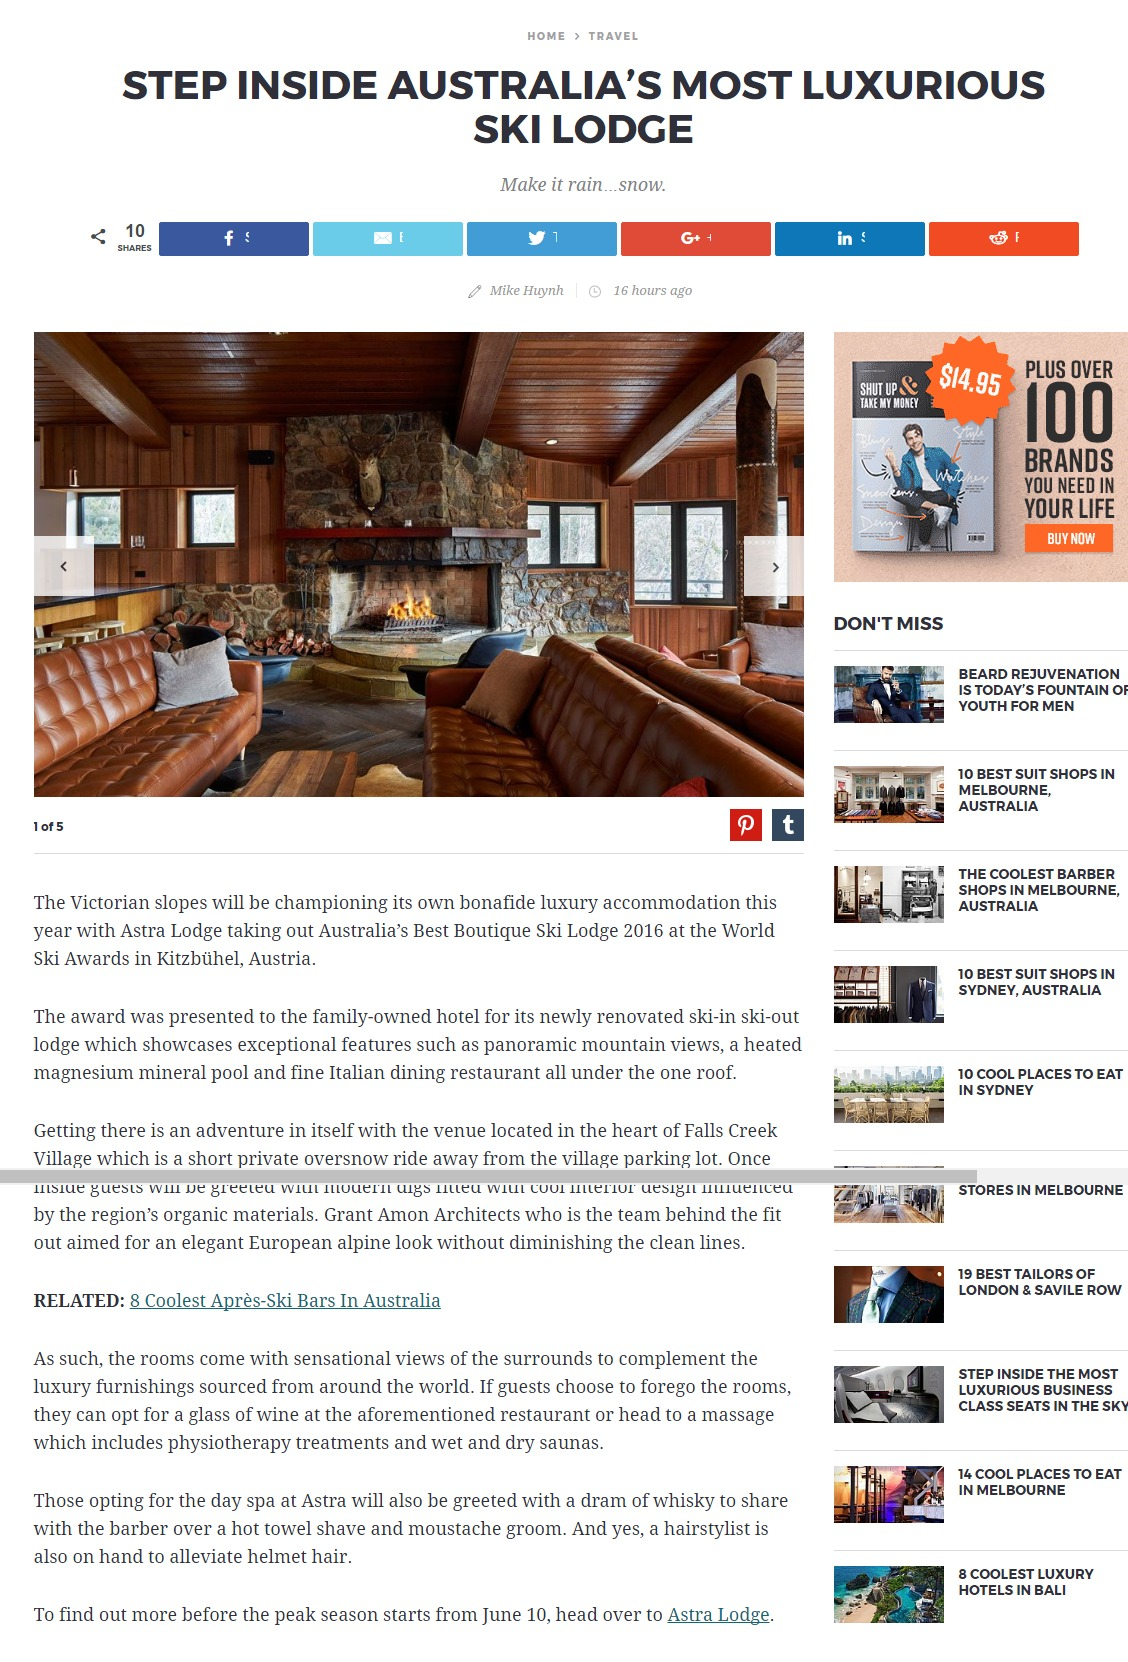 Step Inside Australias Most Luxurious Ski Lodge